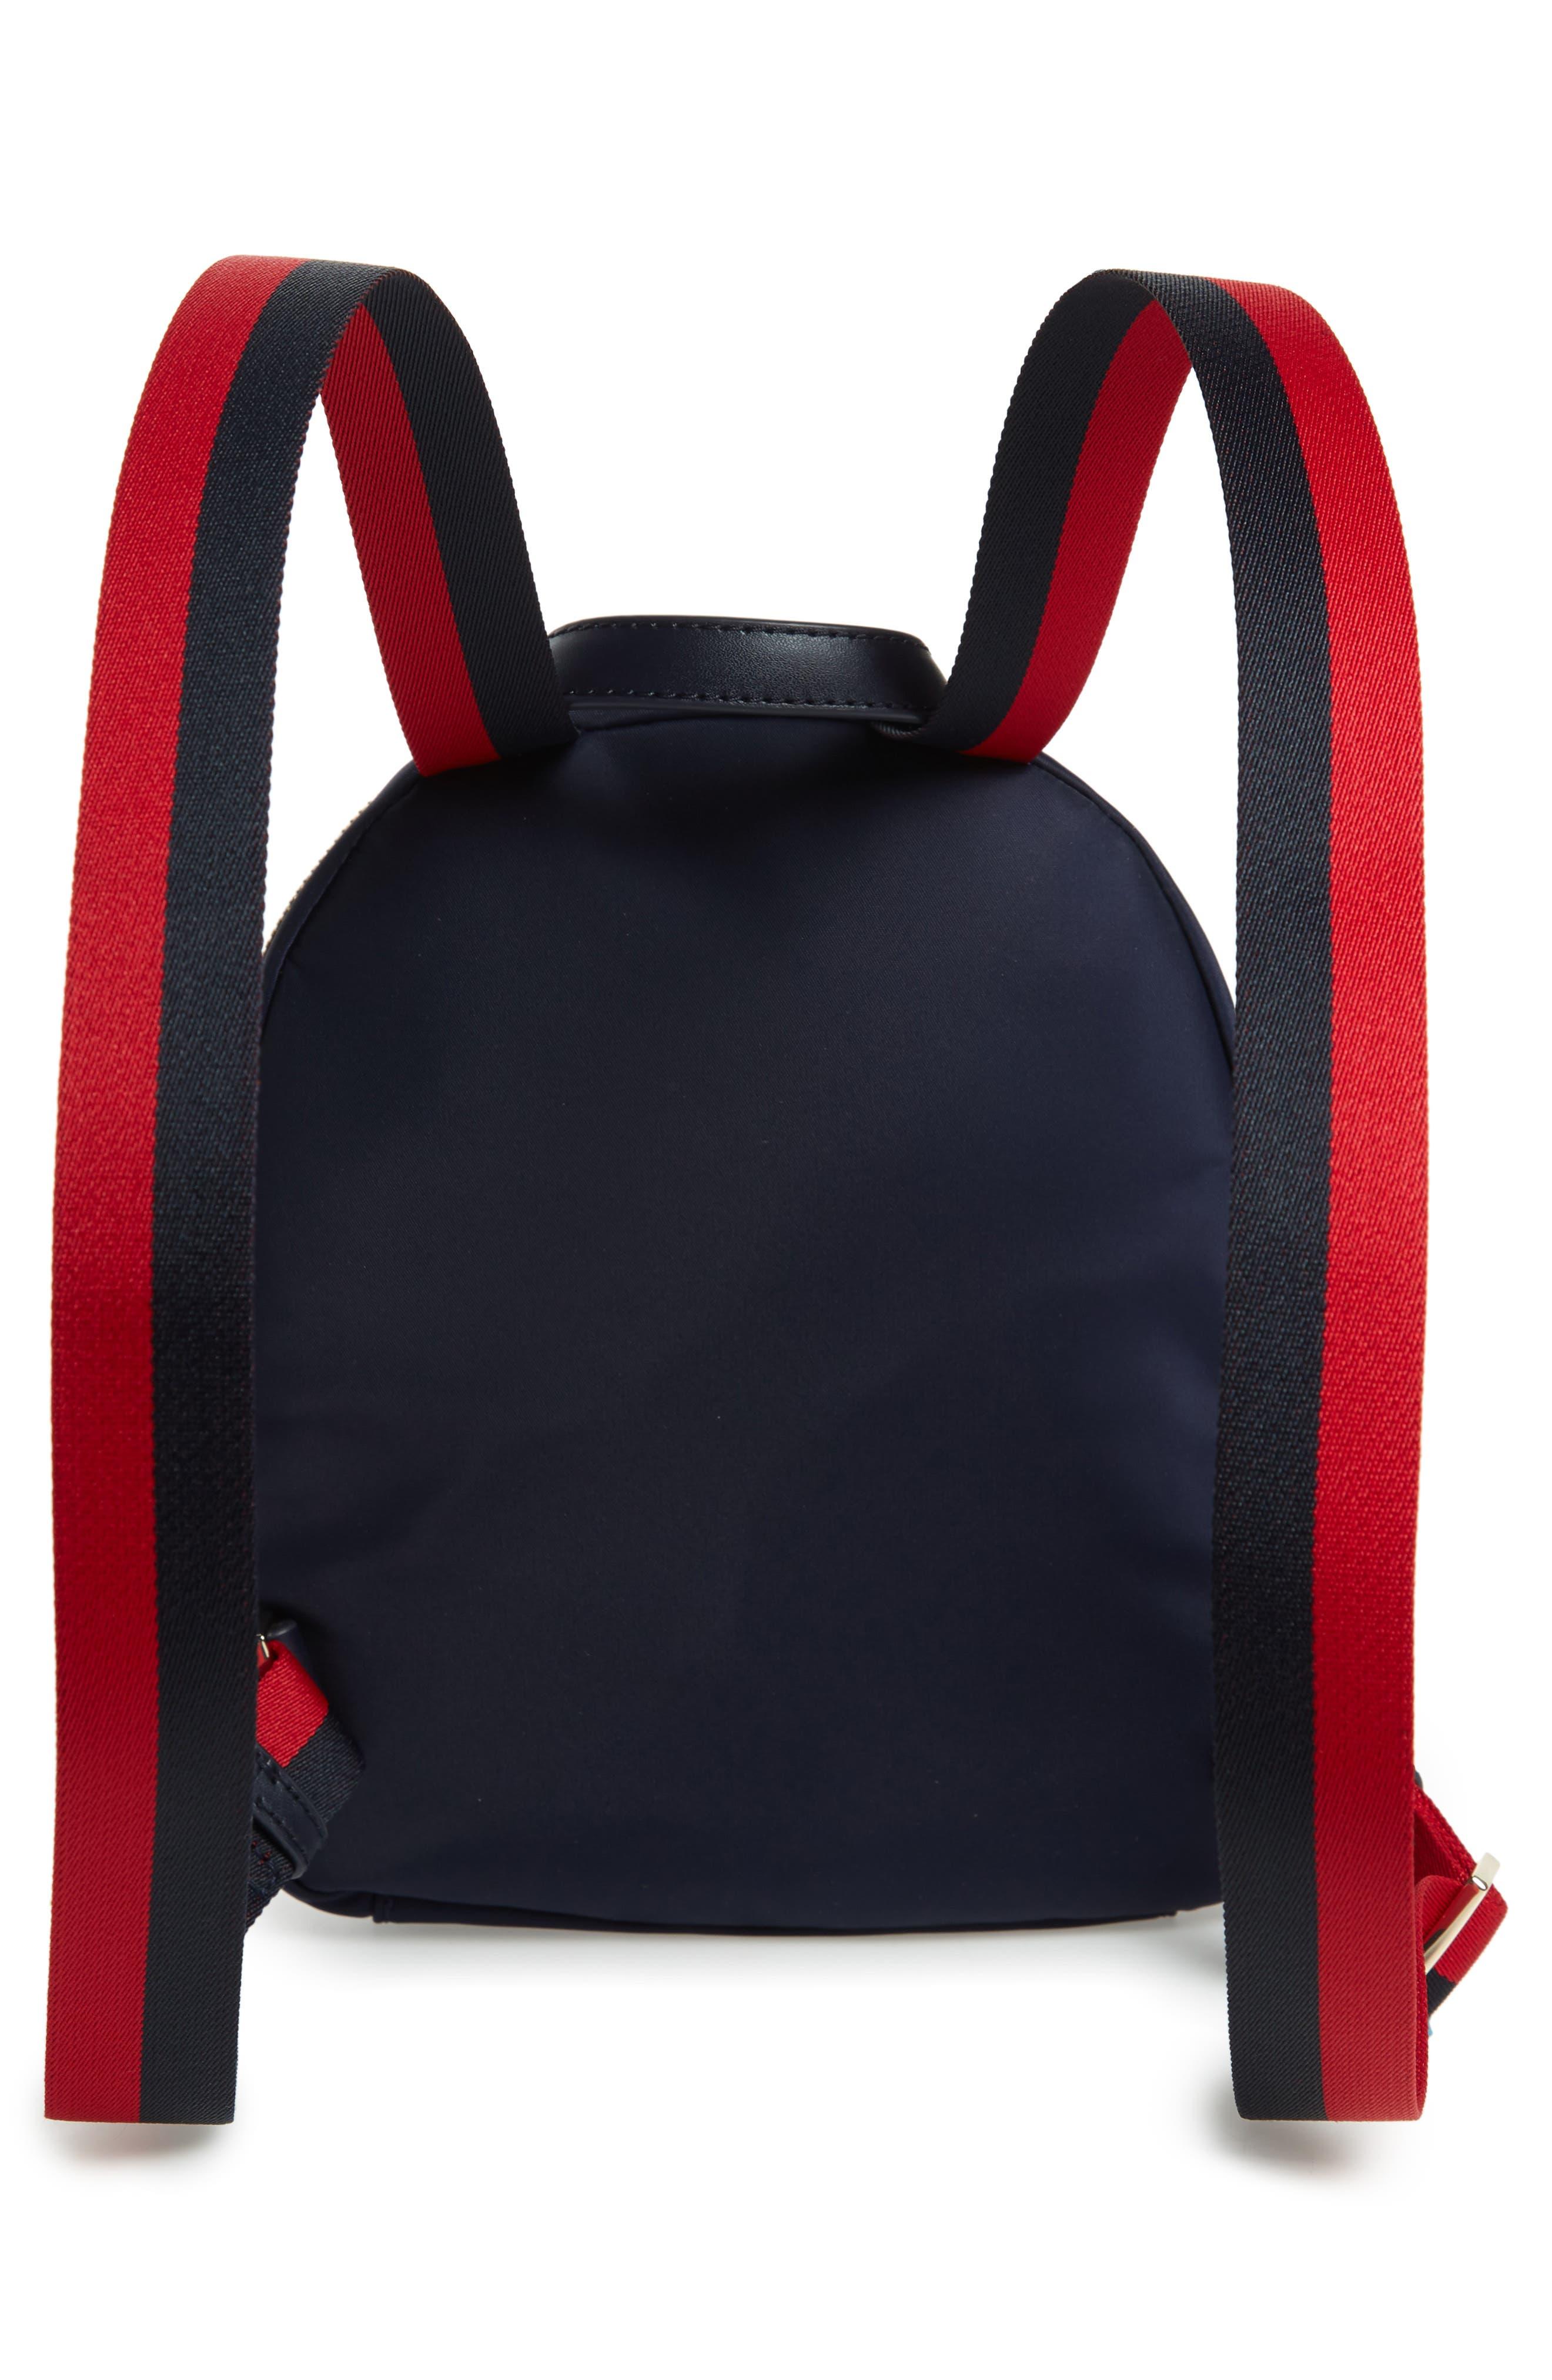 KATE SPADE NEW YORK,                             kate spade watson lane varsity stripe small backpack,                             Alternate thumbnail 3, color,                             400